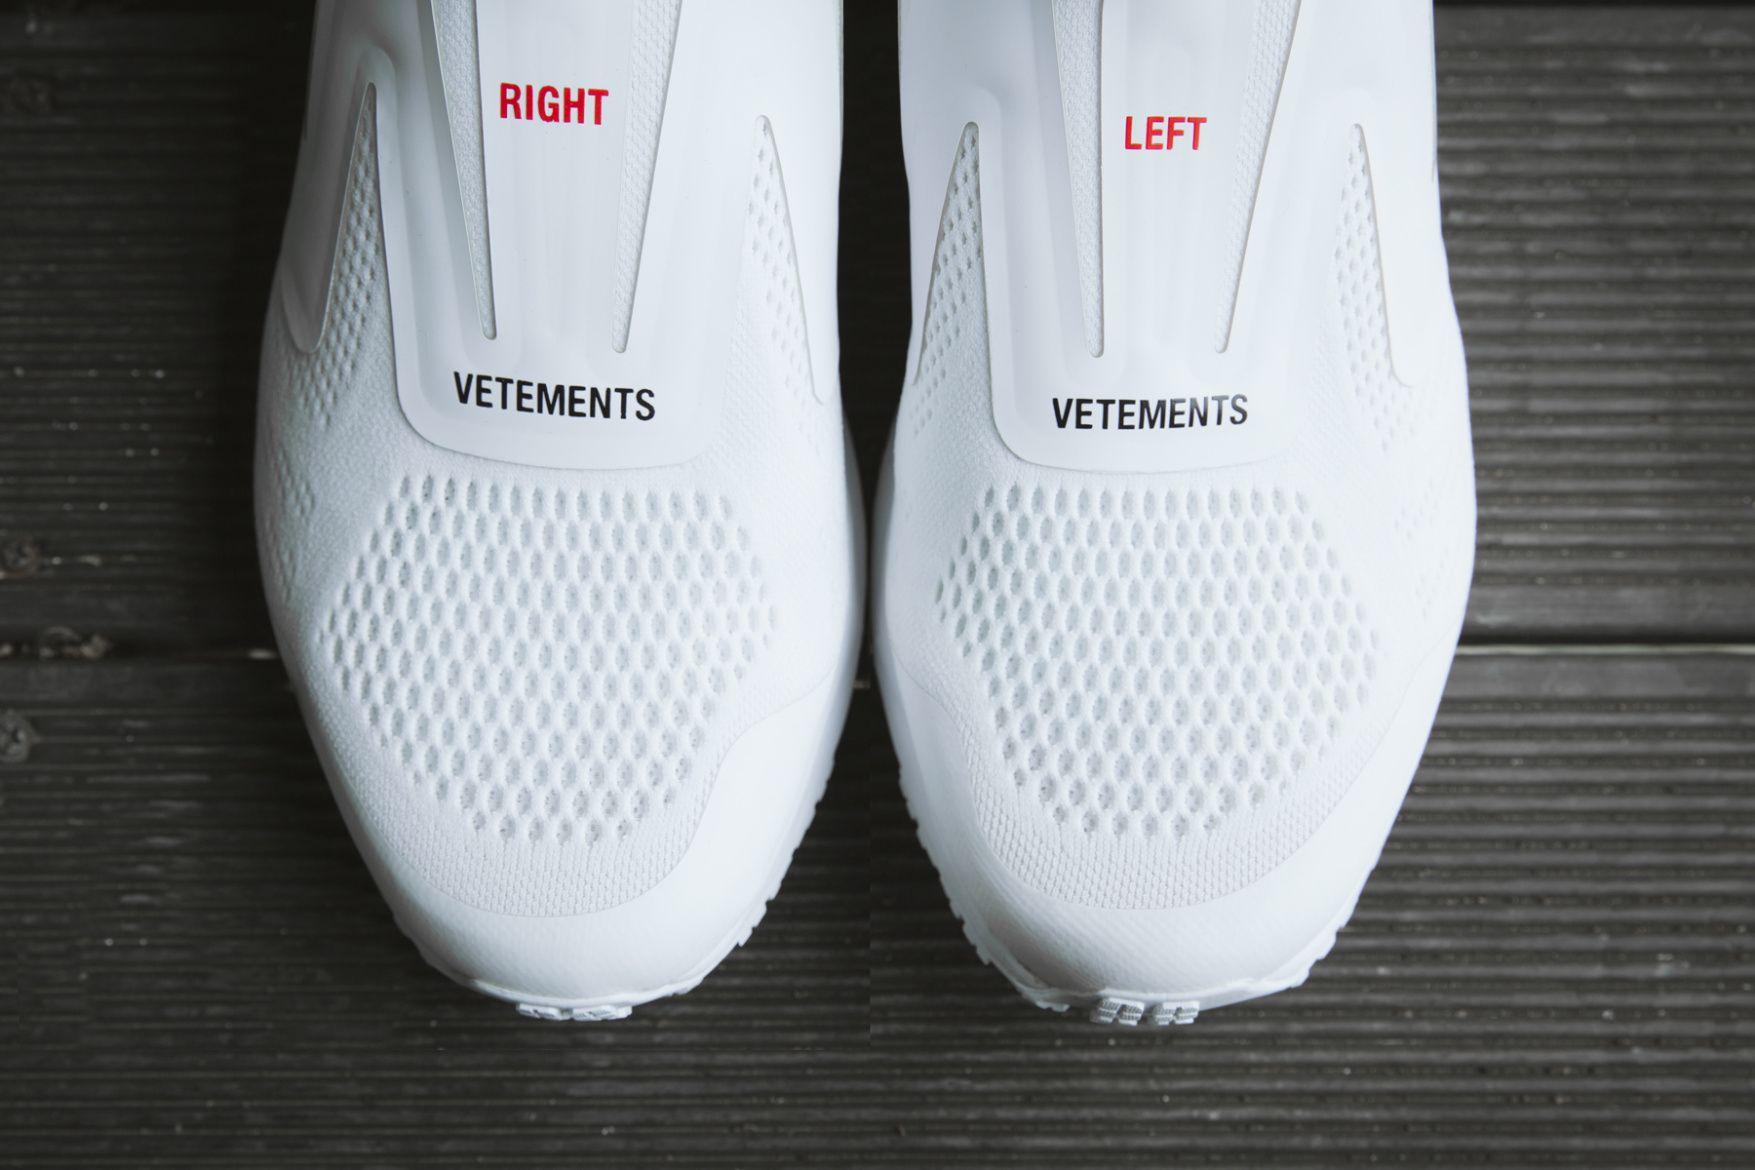 fe378ef21aa9 A Closer Look at the Vetements x Reebok Pump Sneaker Collaboration